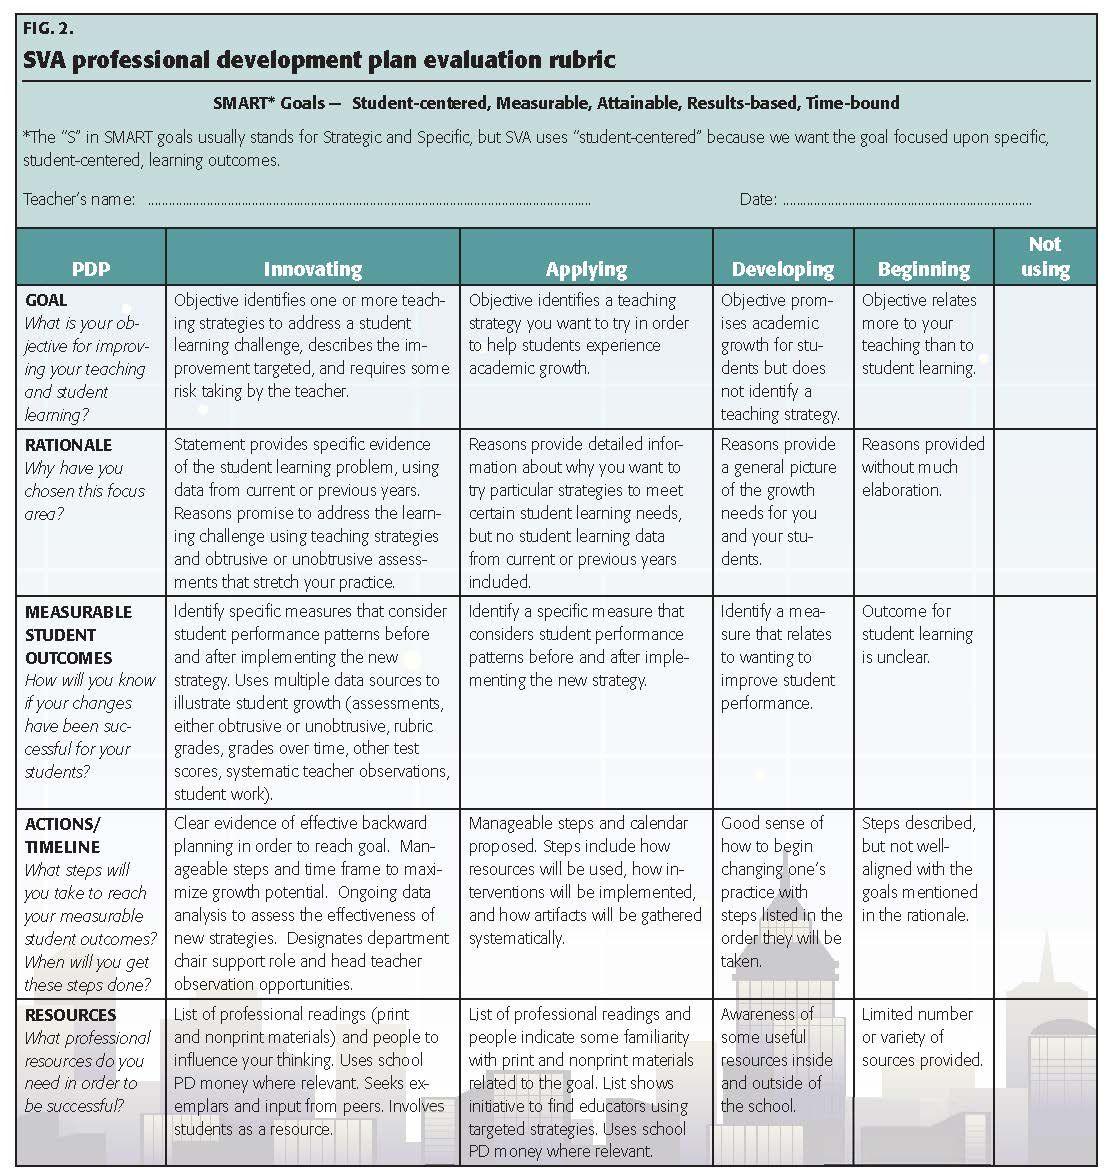 006 Stunning Professional Development Plan Template For School Image  Schools Example Teaching AssistantFull